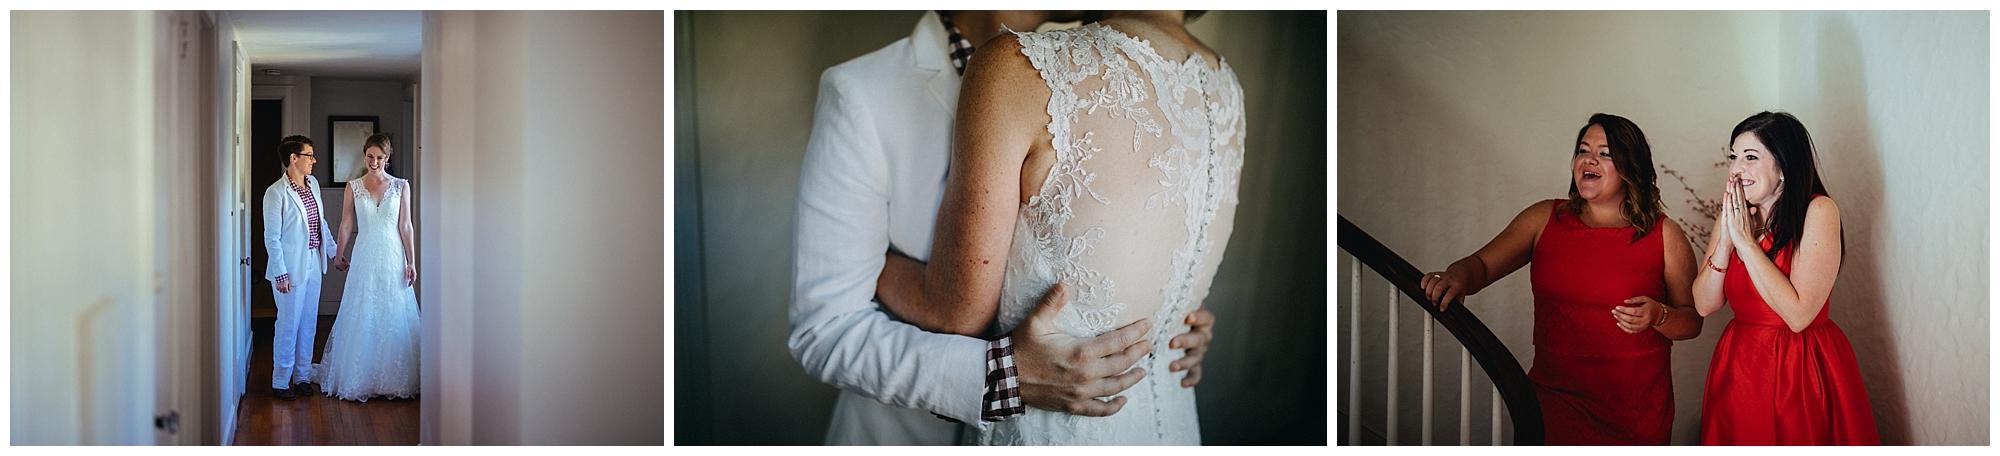 Lesbian-Jewish-Wedding_0010.jpg